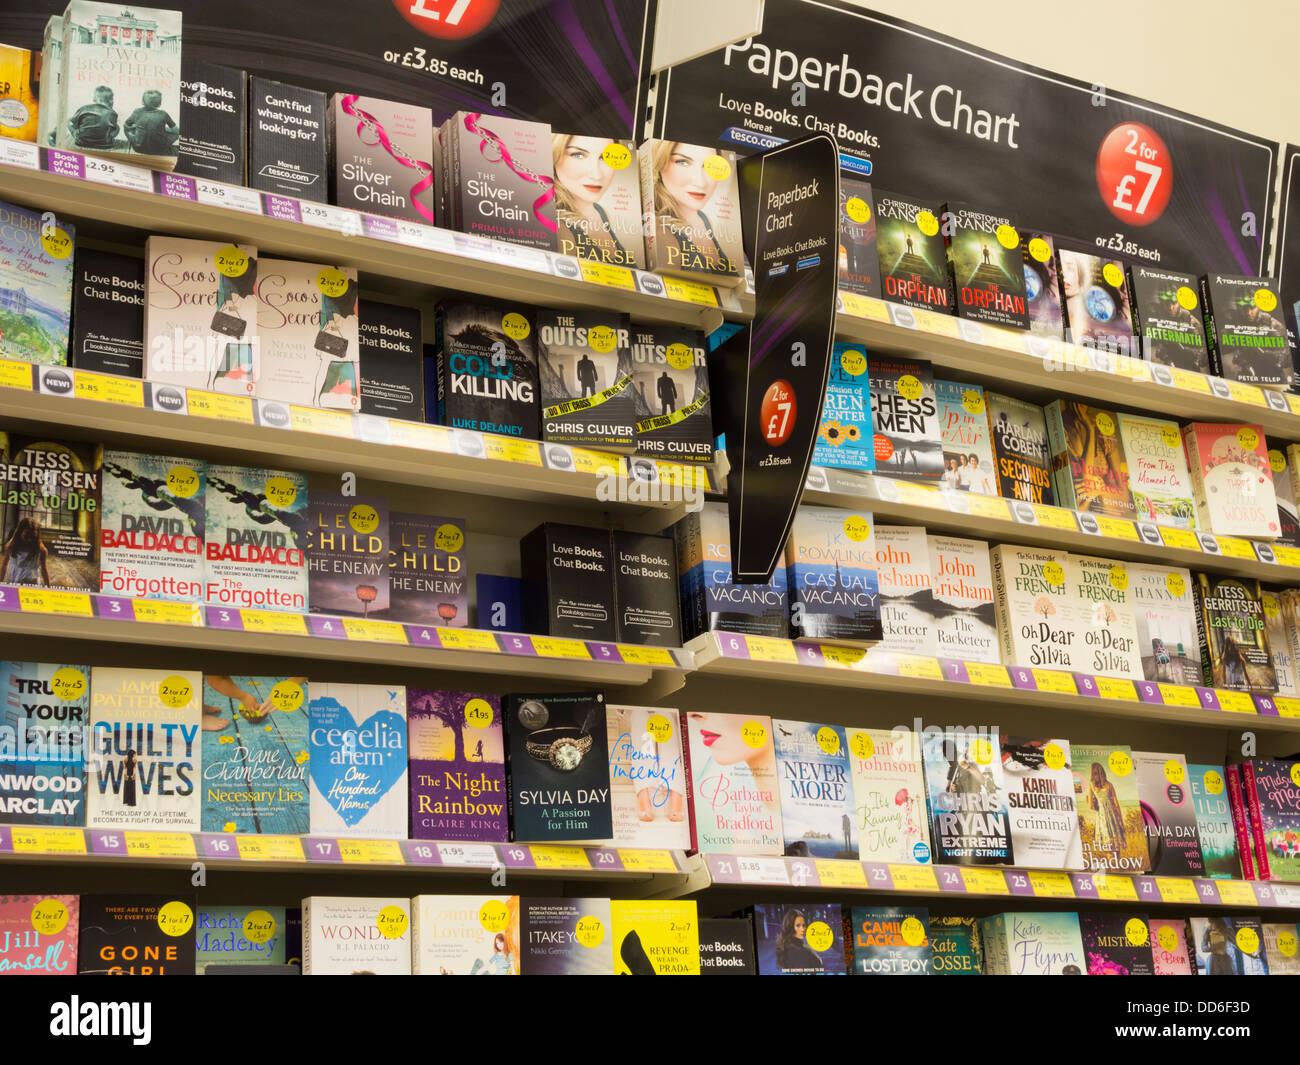 Paperback books in Tesco supermarket. UK - Stock Image